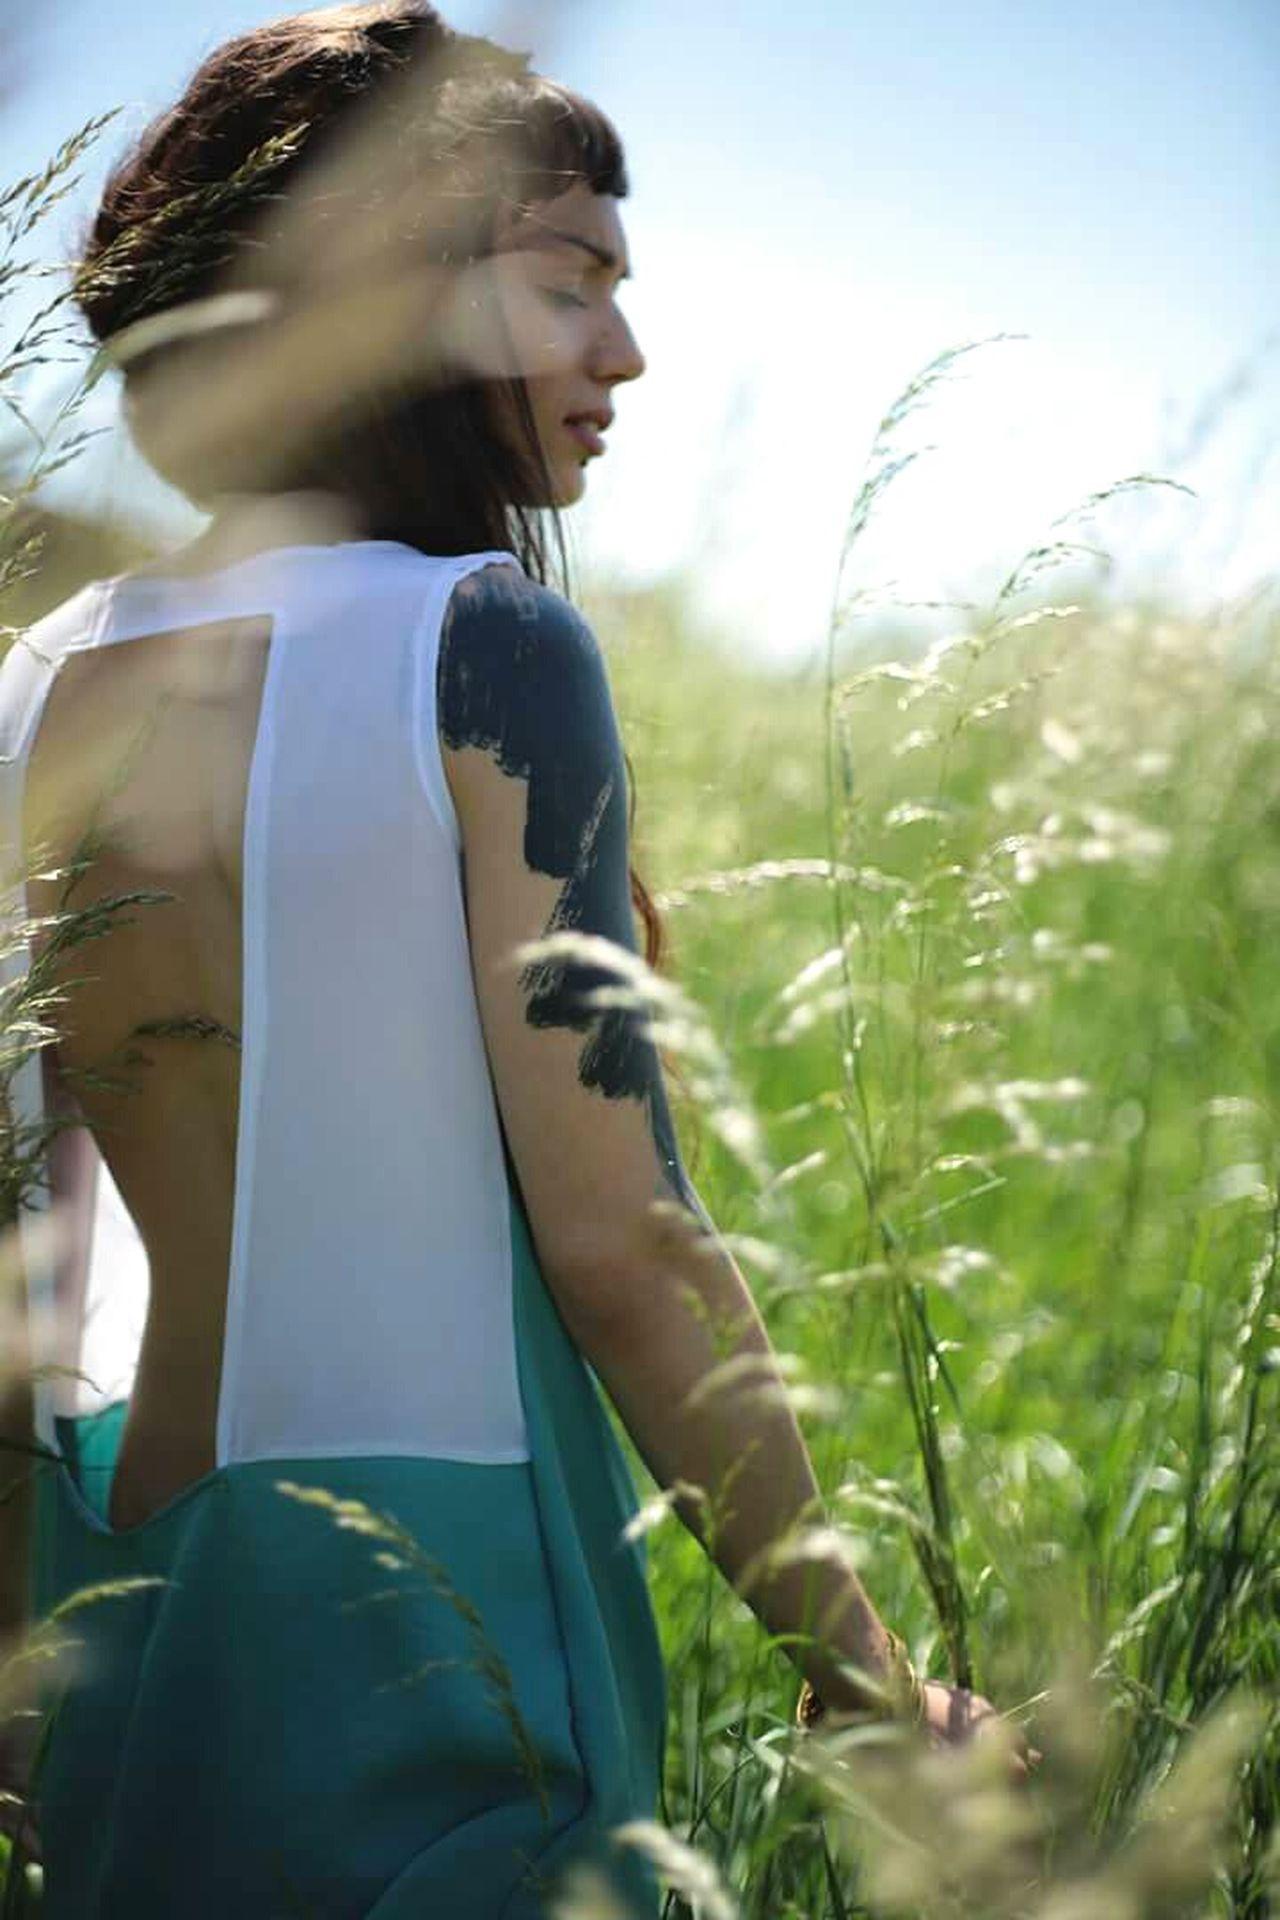 🌴♬❤ Summer Day Nature Grassfield Fashionable Fashionblogger Fashionphotography Tattooedgirls Tattoo Girl Tattooart Blacktattoo Photoshoot Photos Around You Canon_photos Fashionbrand Candybalism First Eyeem Photo The Portraitist - 2017 EyeEm Awards EyeEmNewHere